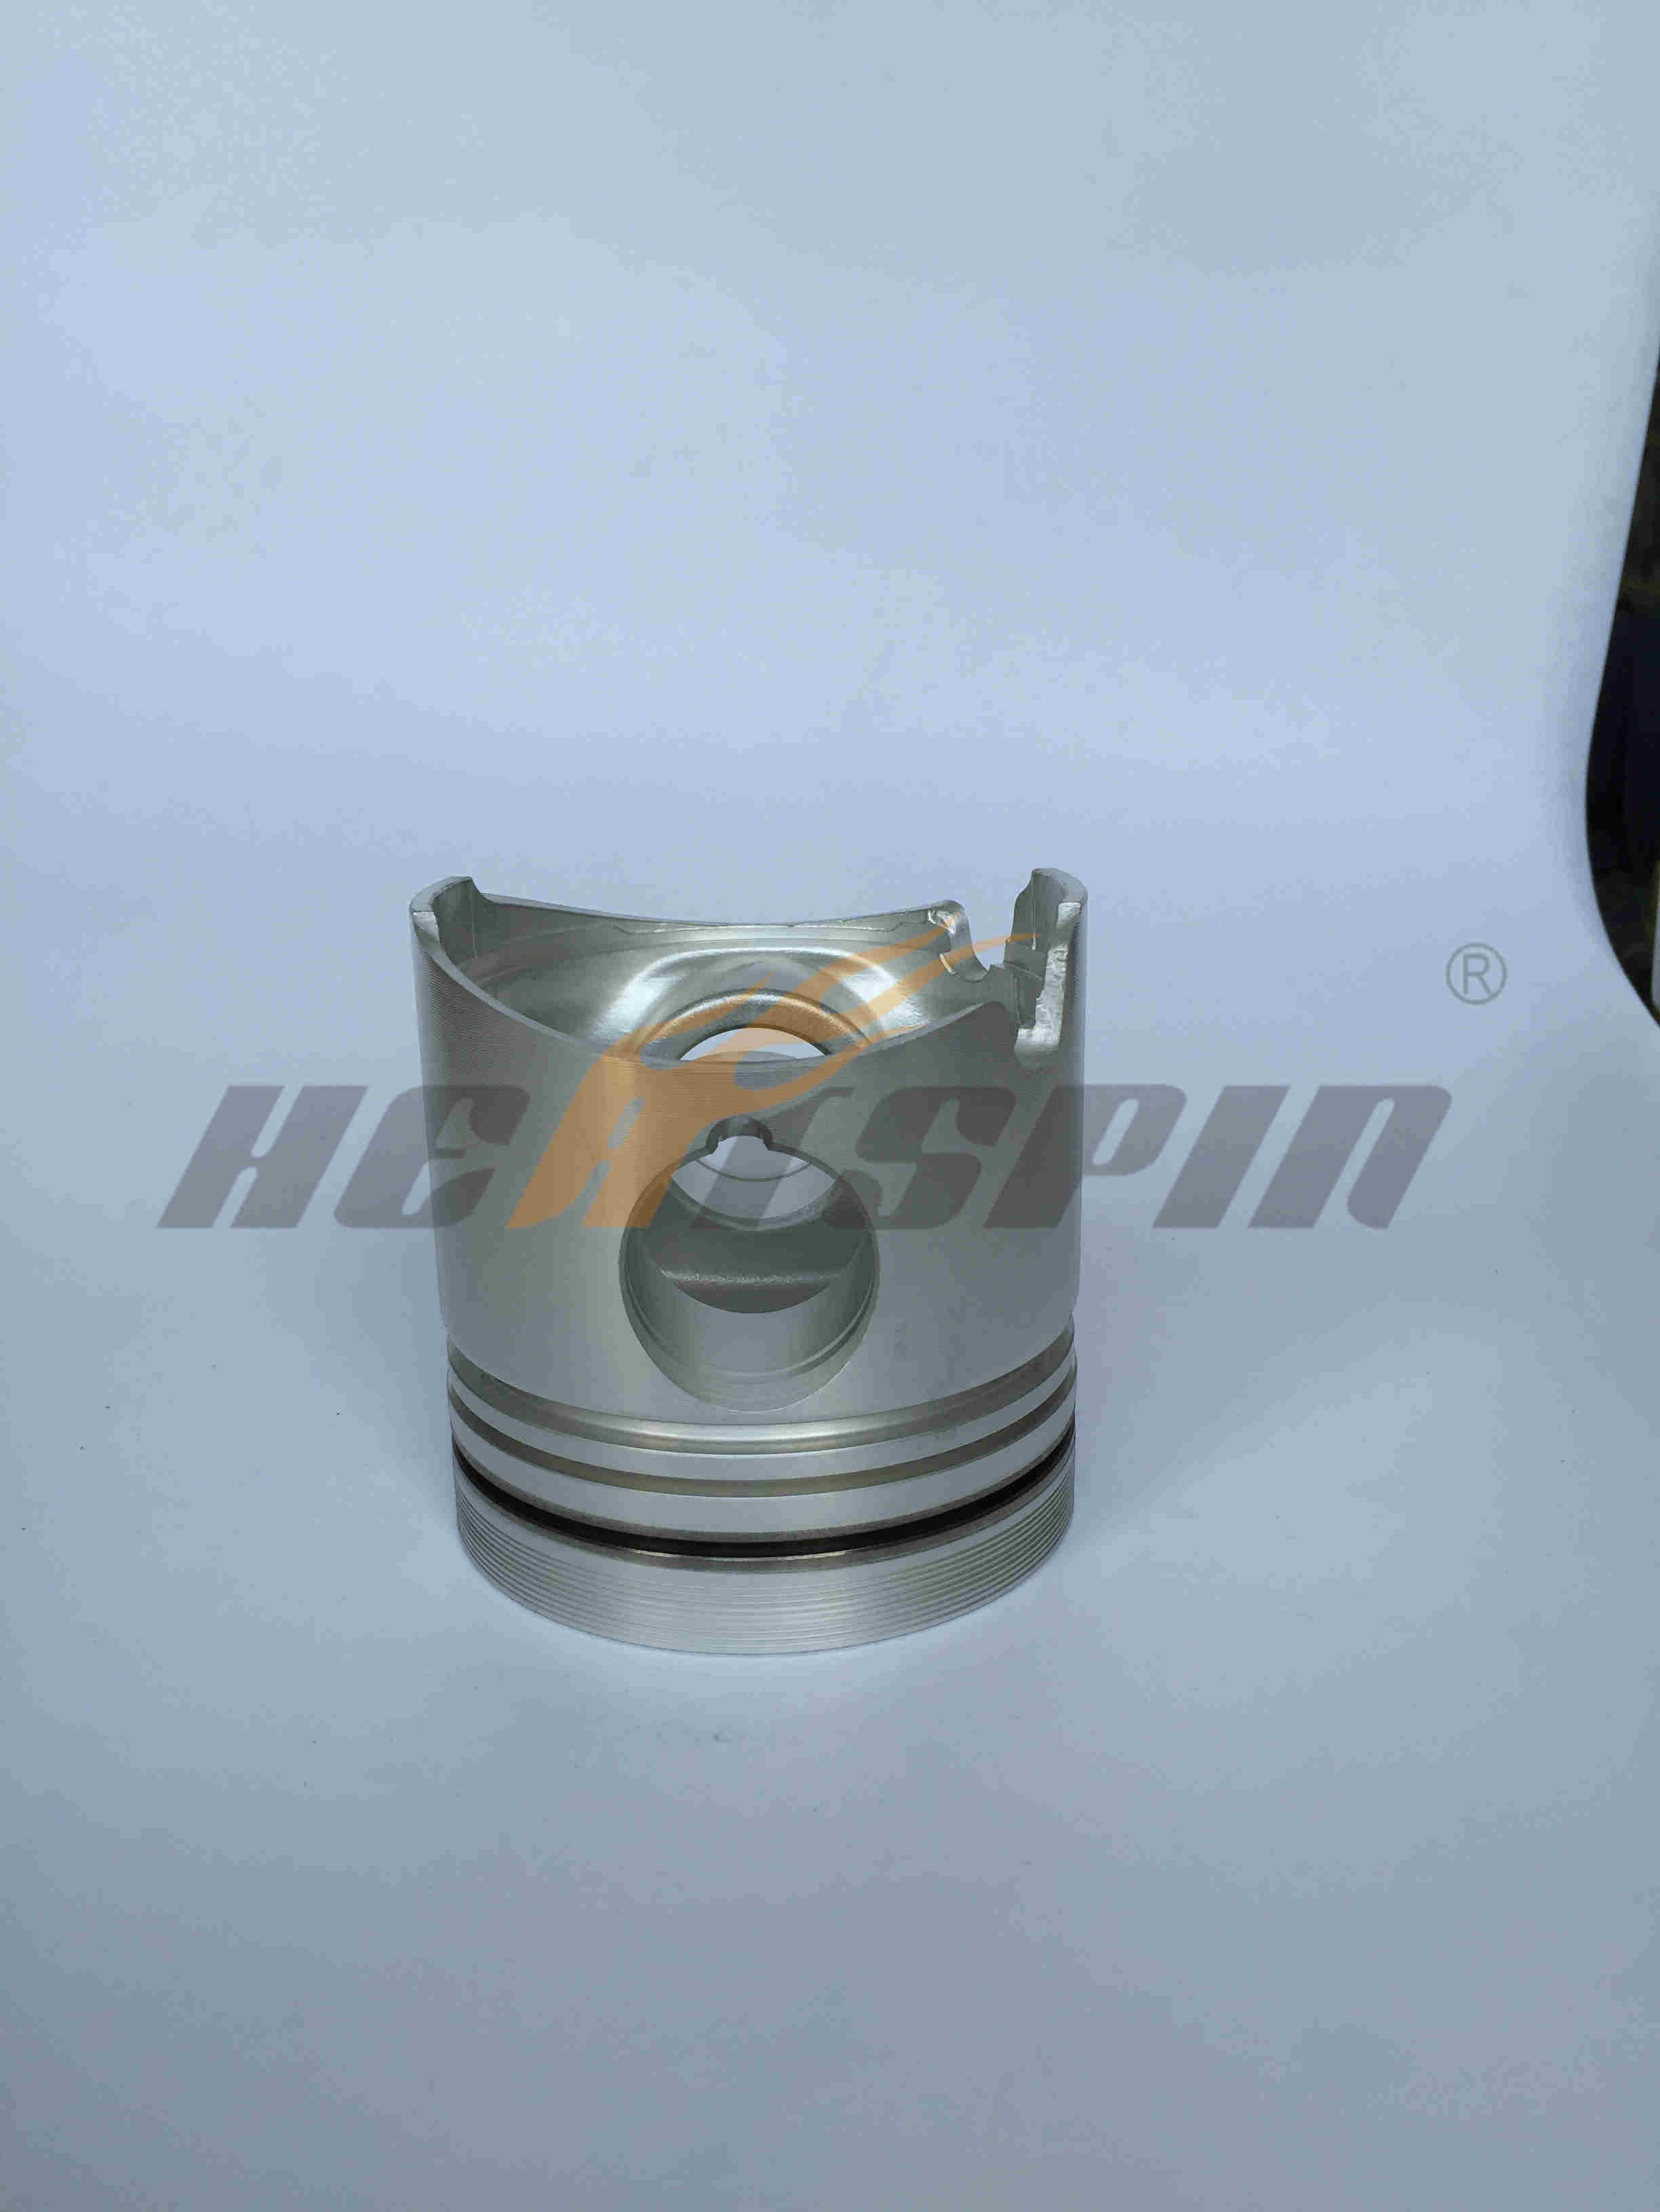 Isuzu Diesel Engine 4jb1 Piston OEM 8-97176-6040 with One Year Warranty